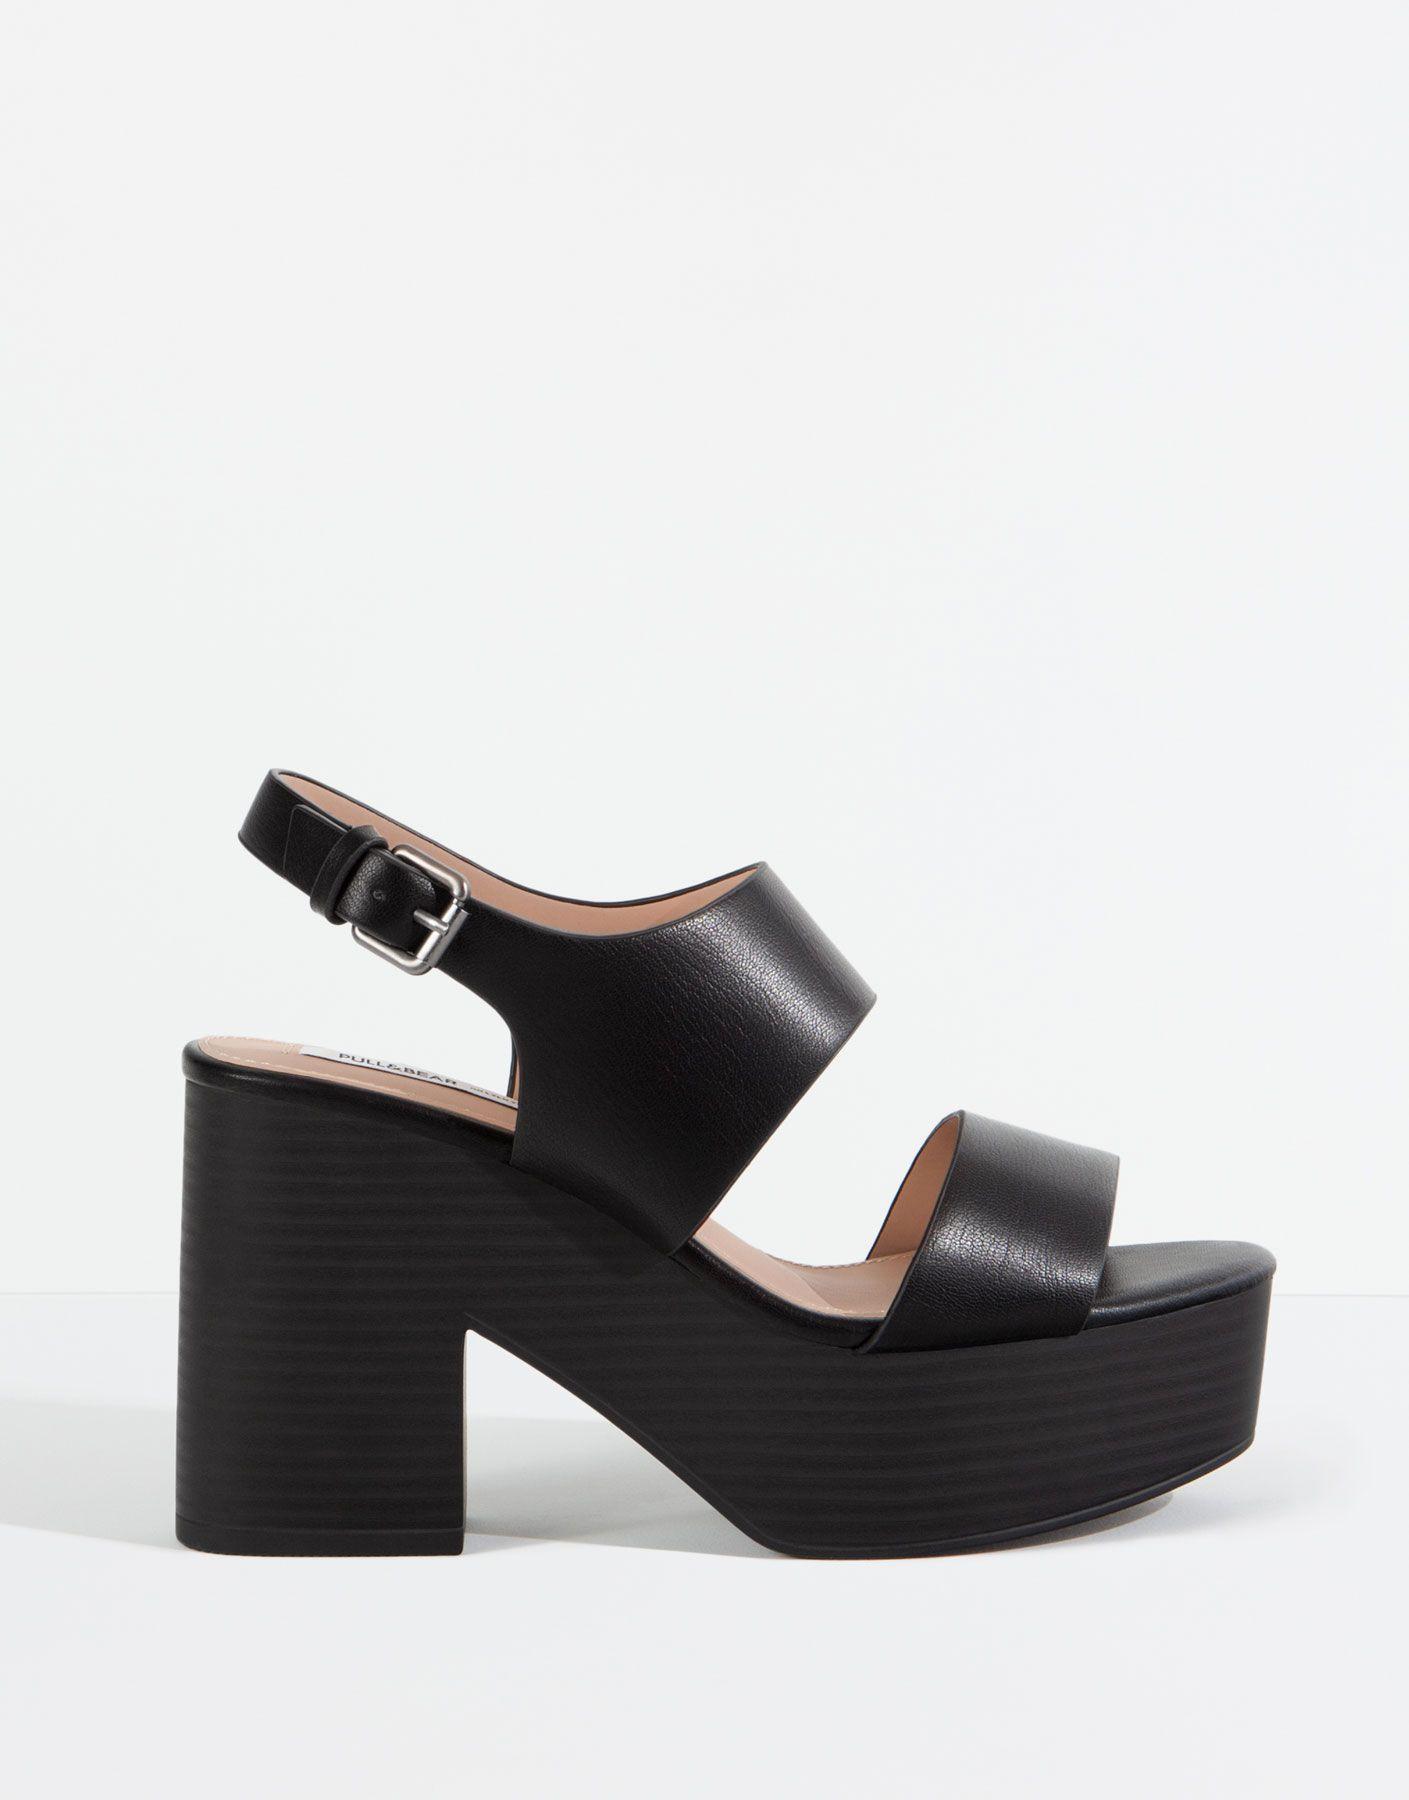 Sandalia Tacon Bloque Negra Zapatos Mujer Mujer Pull Bear Mexico Shoes Women Shoes Heels